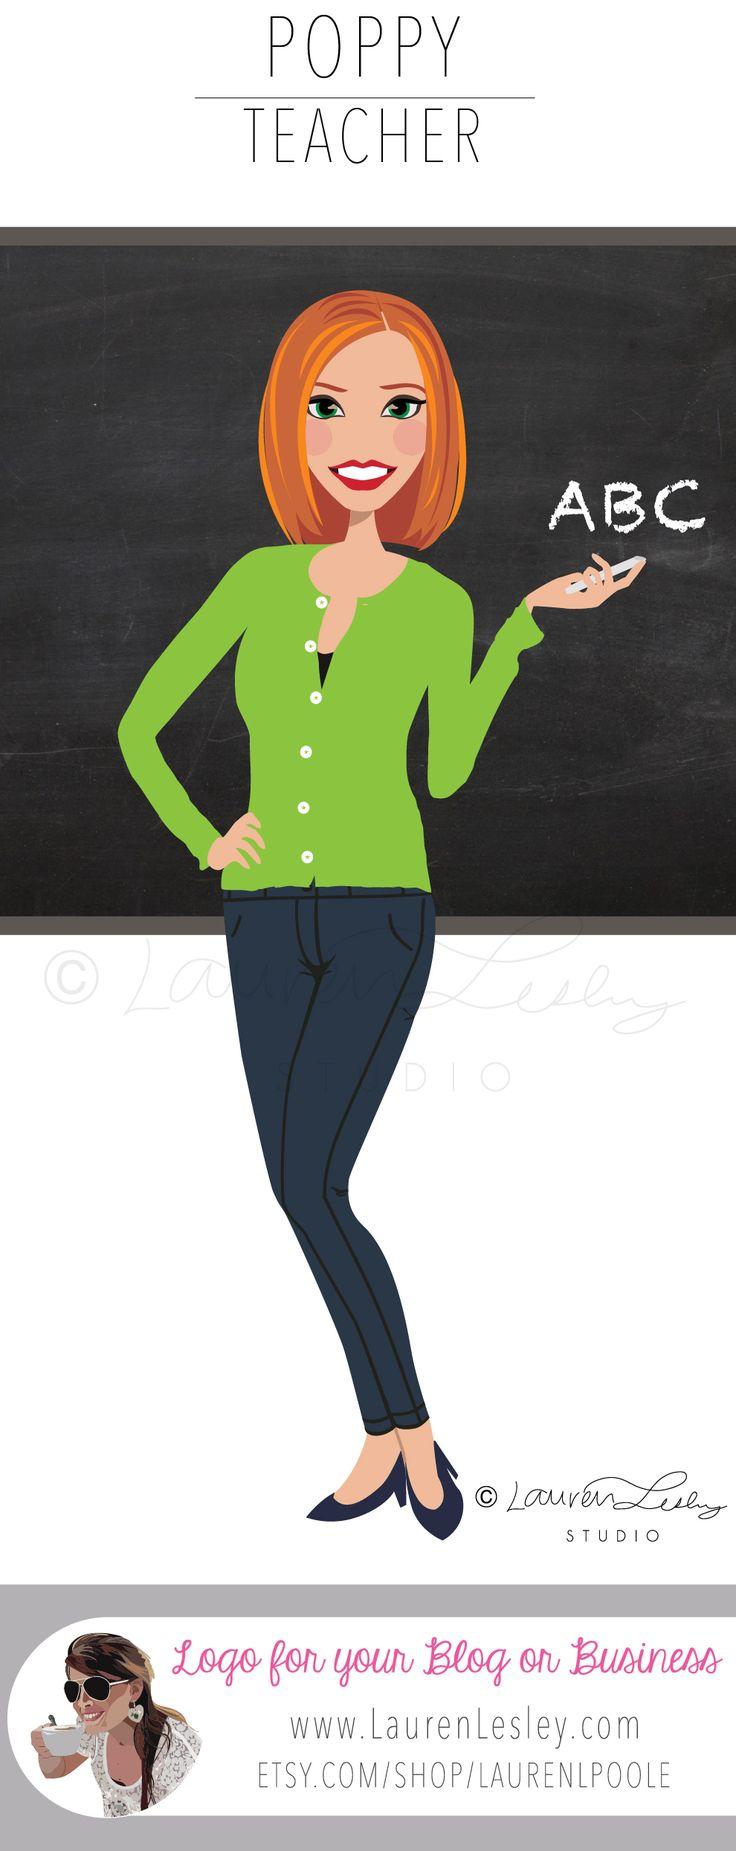 Teacher Illustration Logo | Tutor Professor Instructor Clip Art | Character Design | Avatar | Portrait | Chalkboard | ABC Designed by Lauren Lesley Studio. All rights reserved.